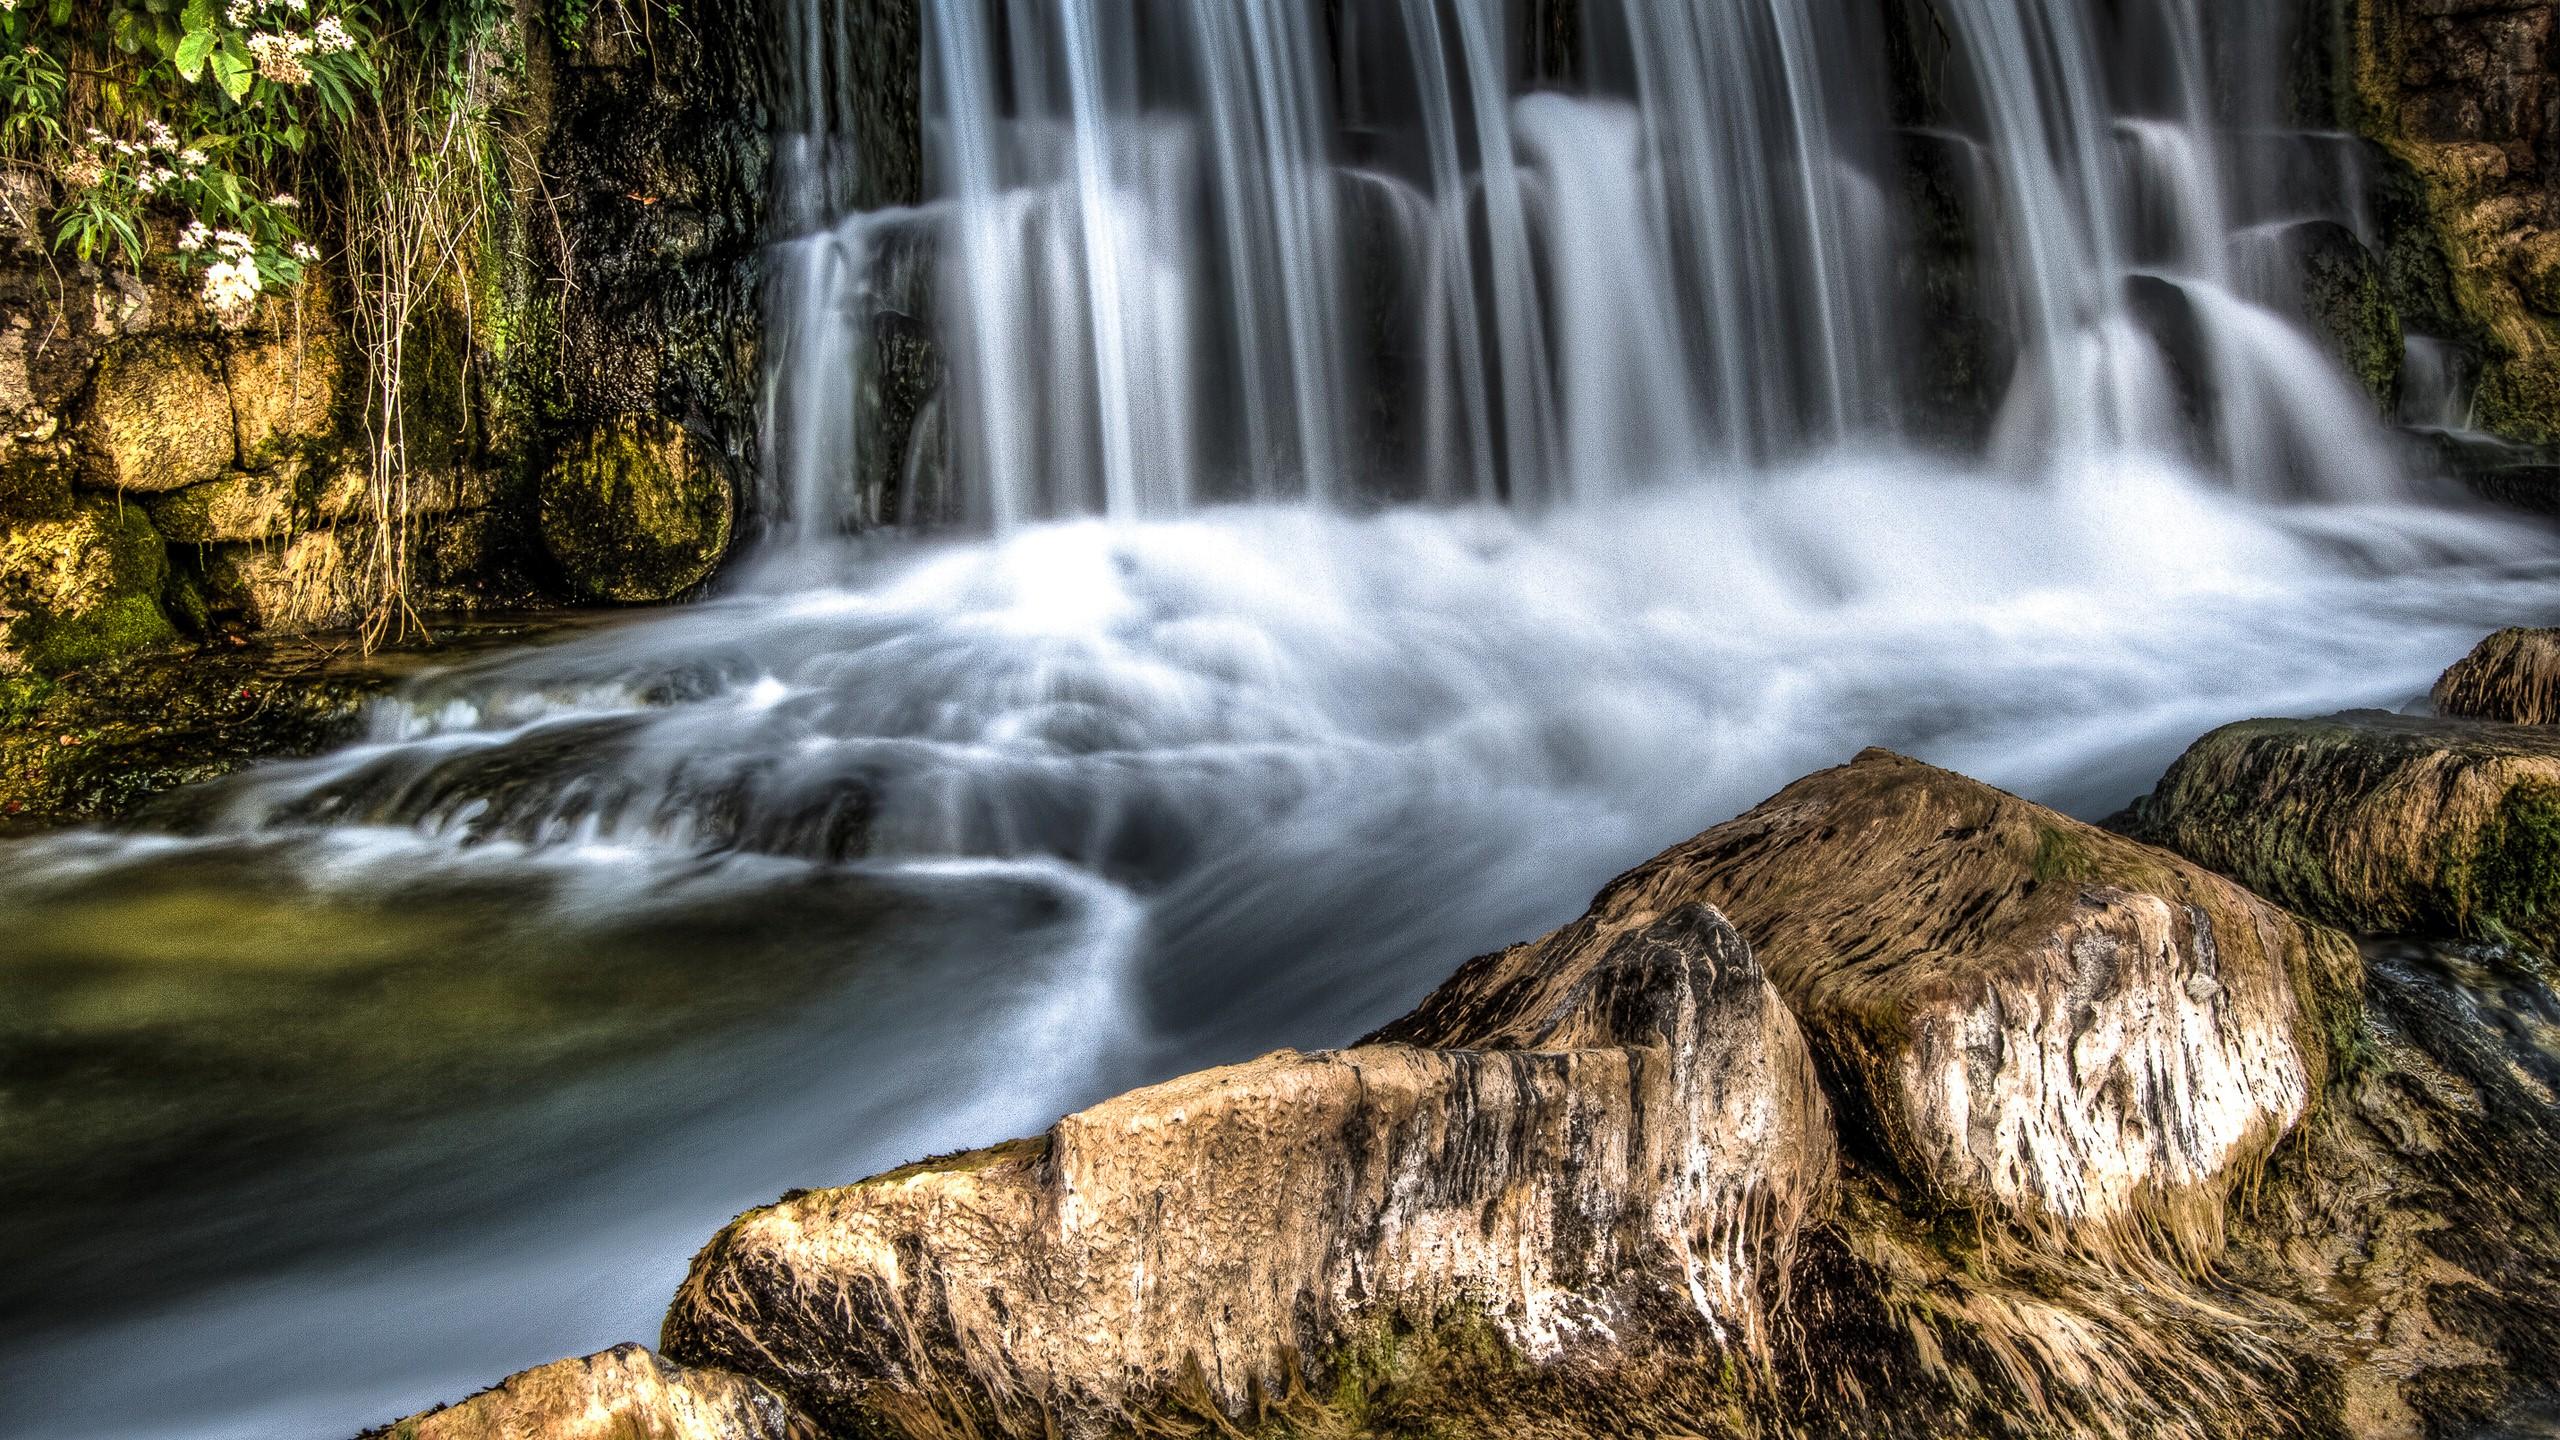 Rhine Falls in Switzerland HD Wallpapers 2560x1440